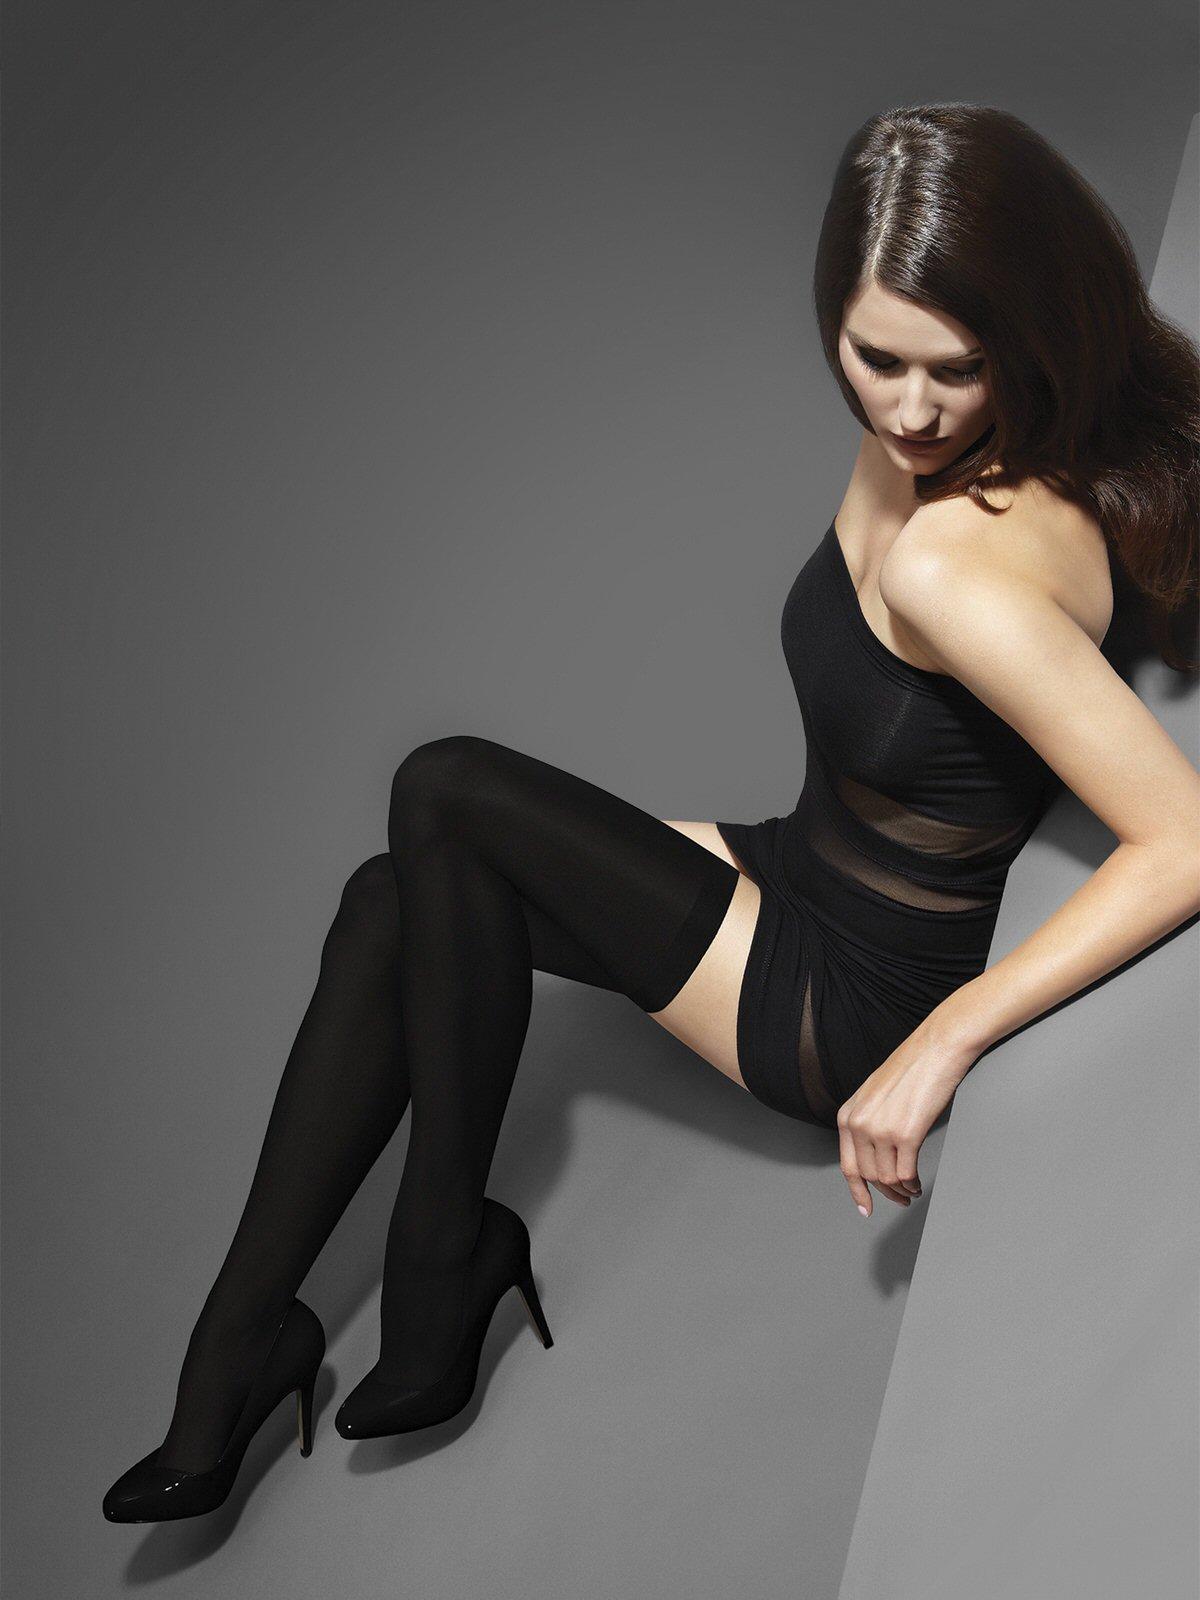 Marilyn Lux14-04